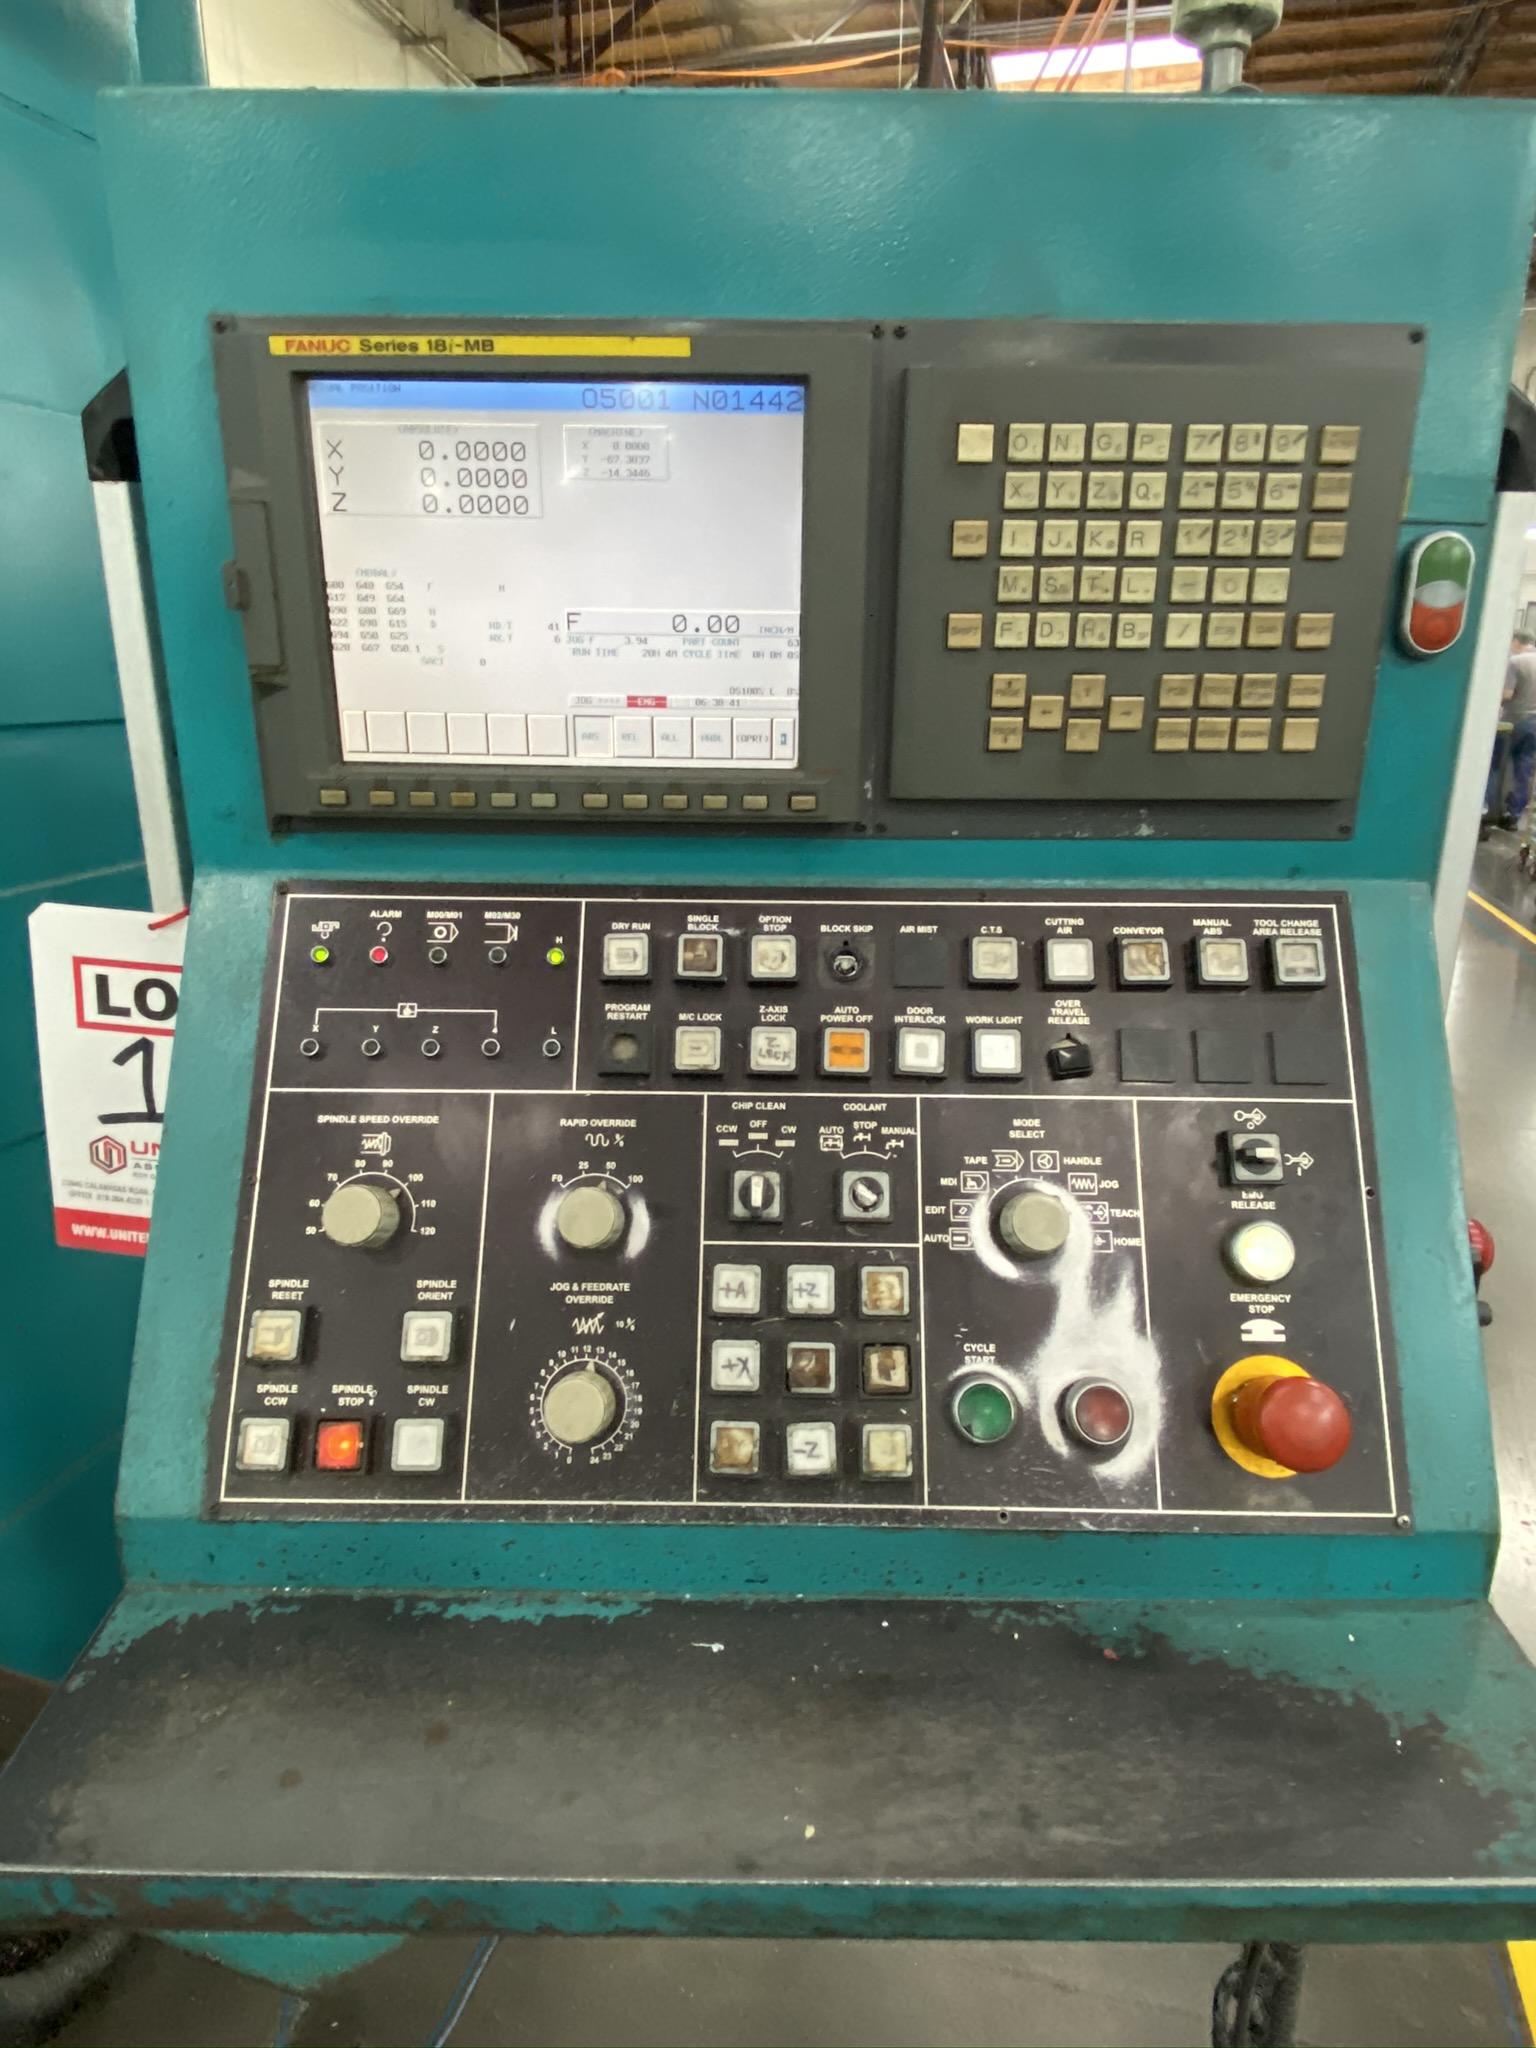 2005 SIGMA CNC DOUBLE COLUMN MACHINING CENTER, MODEL SDV-3219, FANUC 18IMB CNC CONTROL - Image 4 of 31